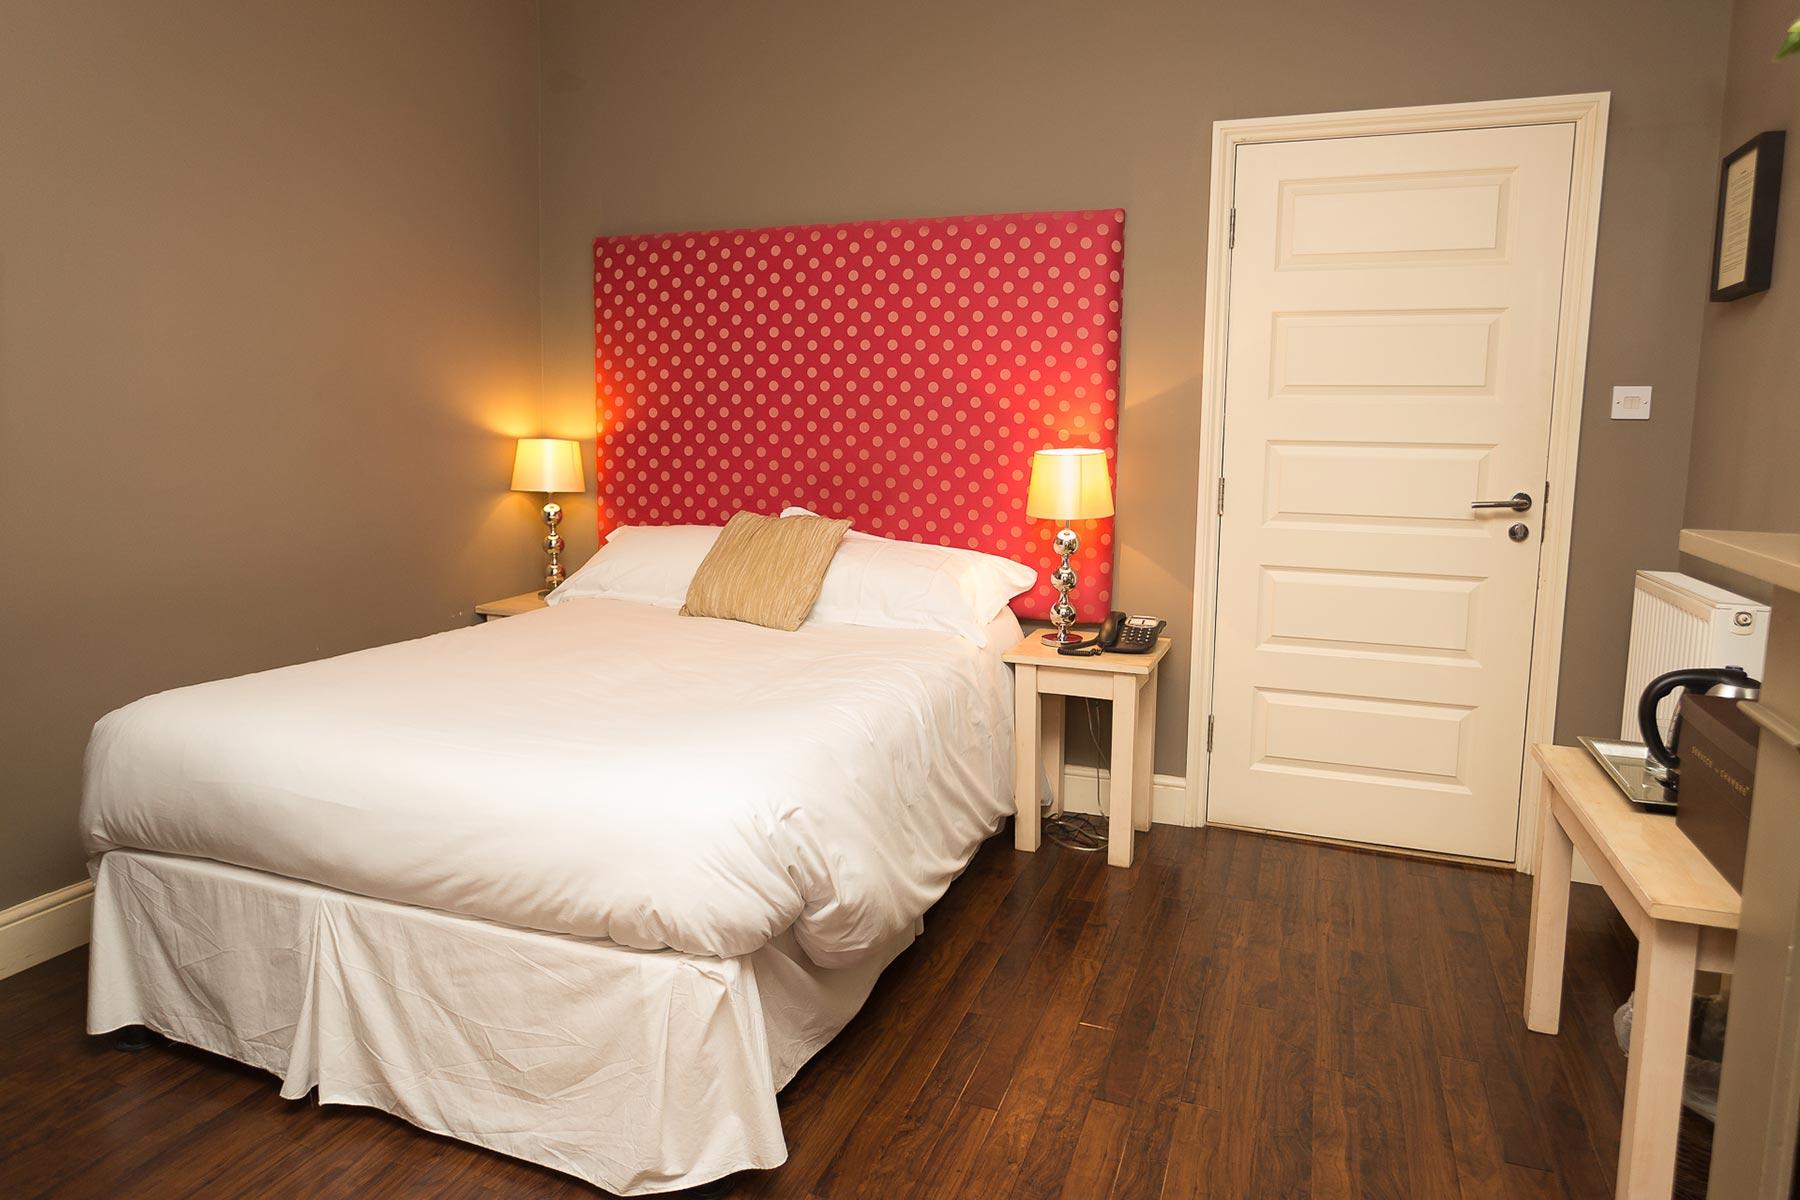 Hotel room near Snetterton Race Circuit image